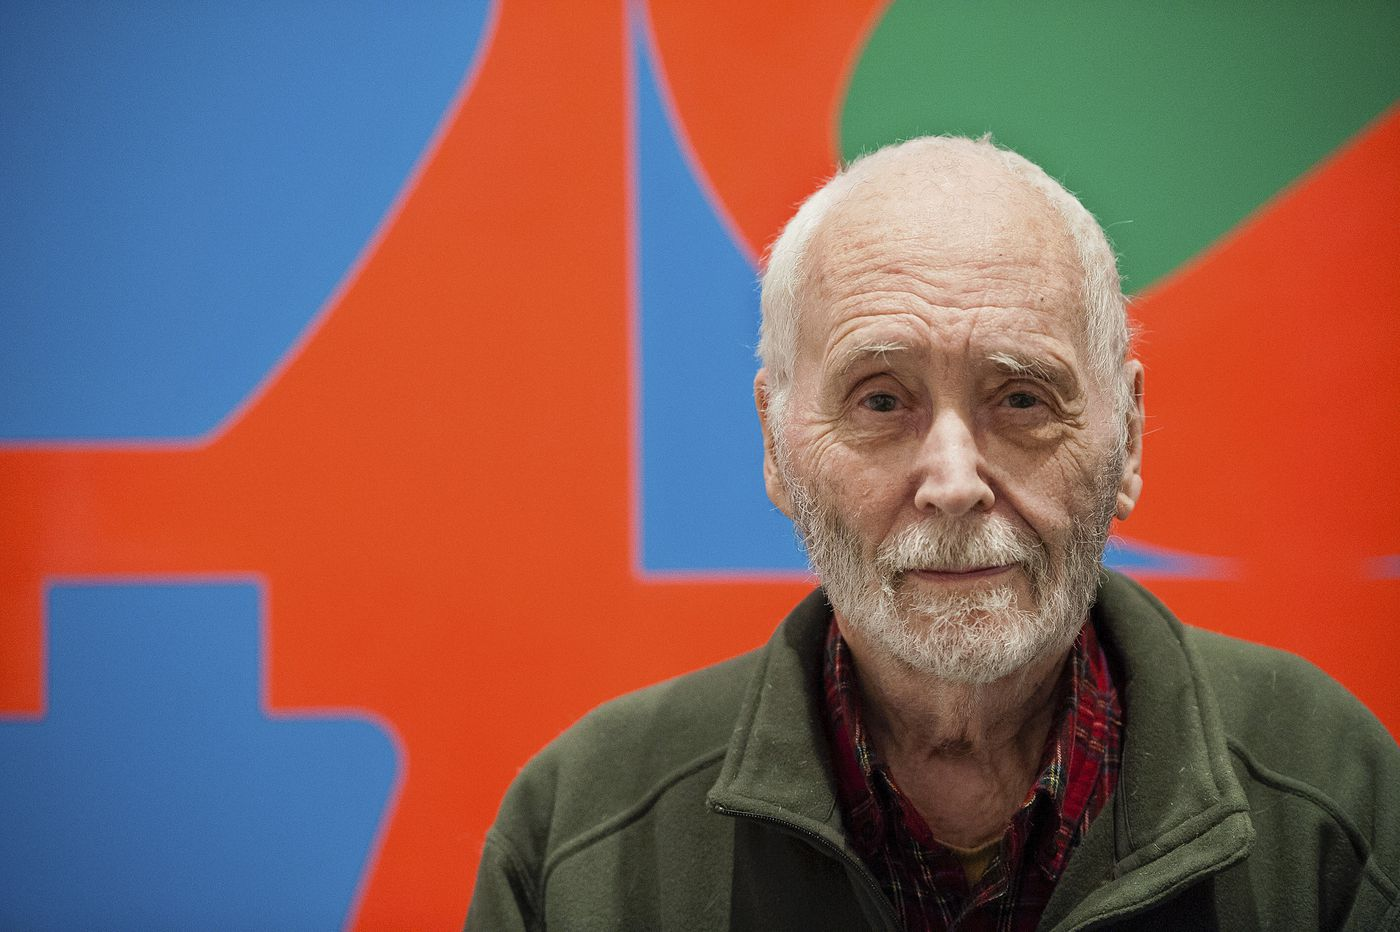 Caretaker of 'LOVE' artist Robert Indiana sues for cost of legal defense